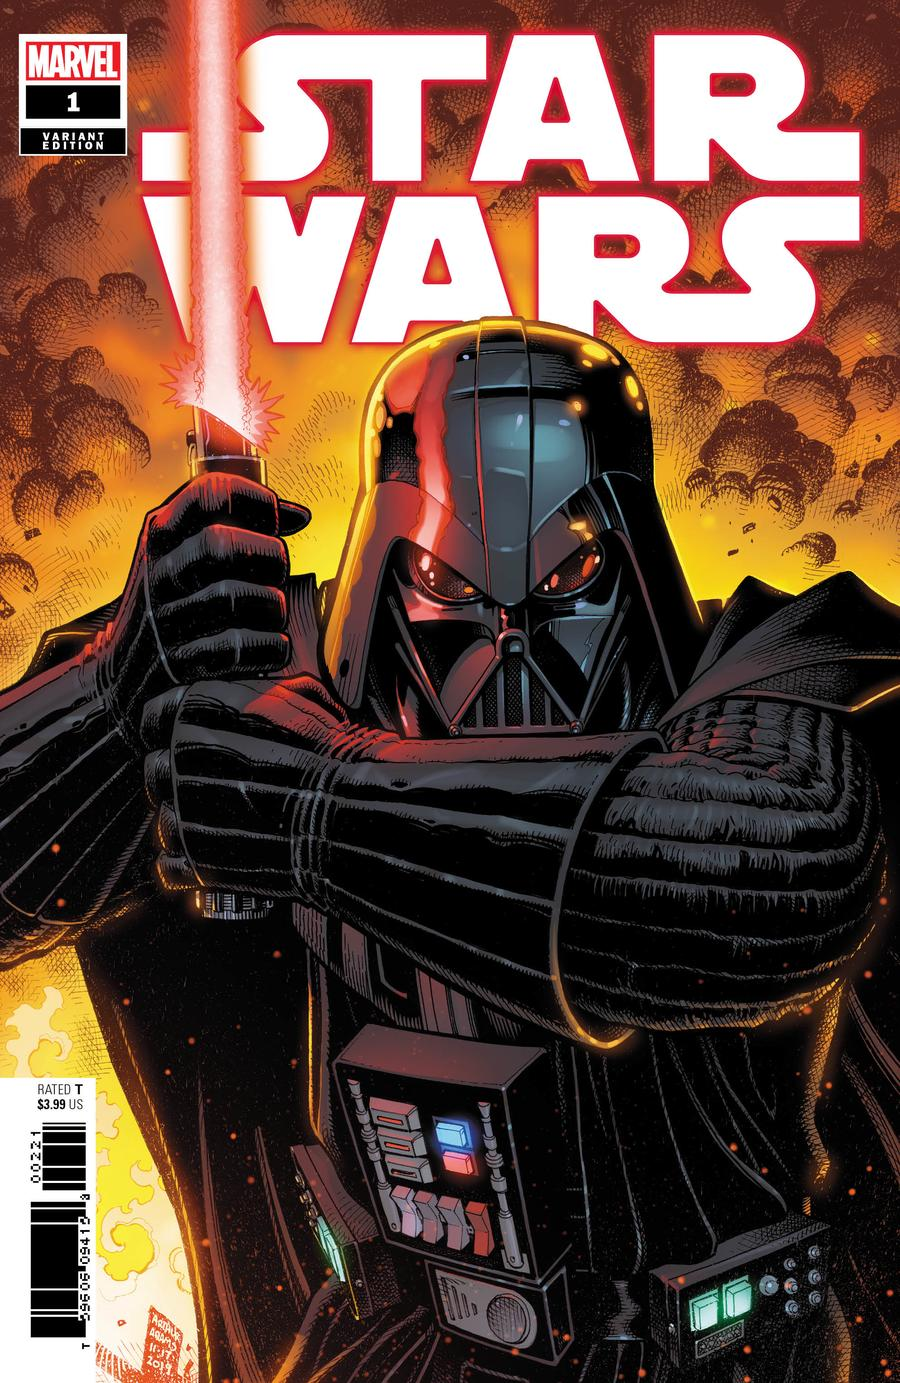 Star Wars Vol 5 #1 Cover F Incentive Arthur Adams Variant Cover